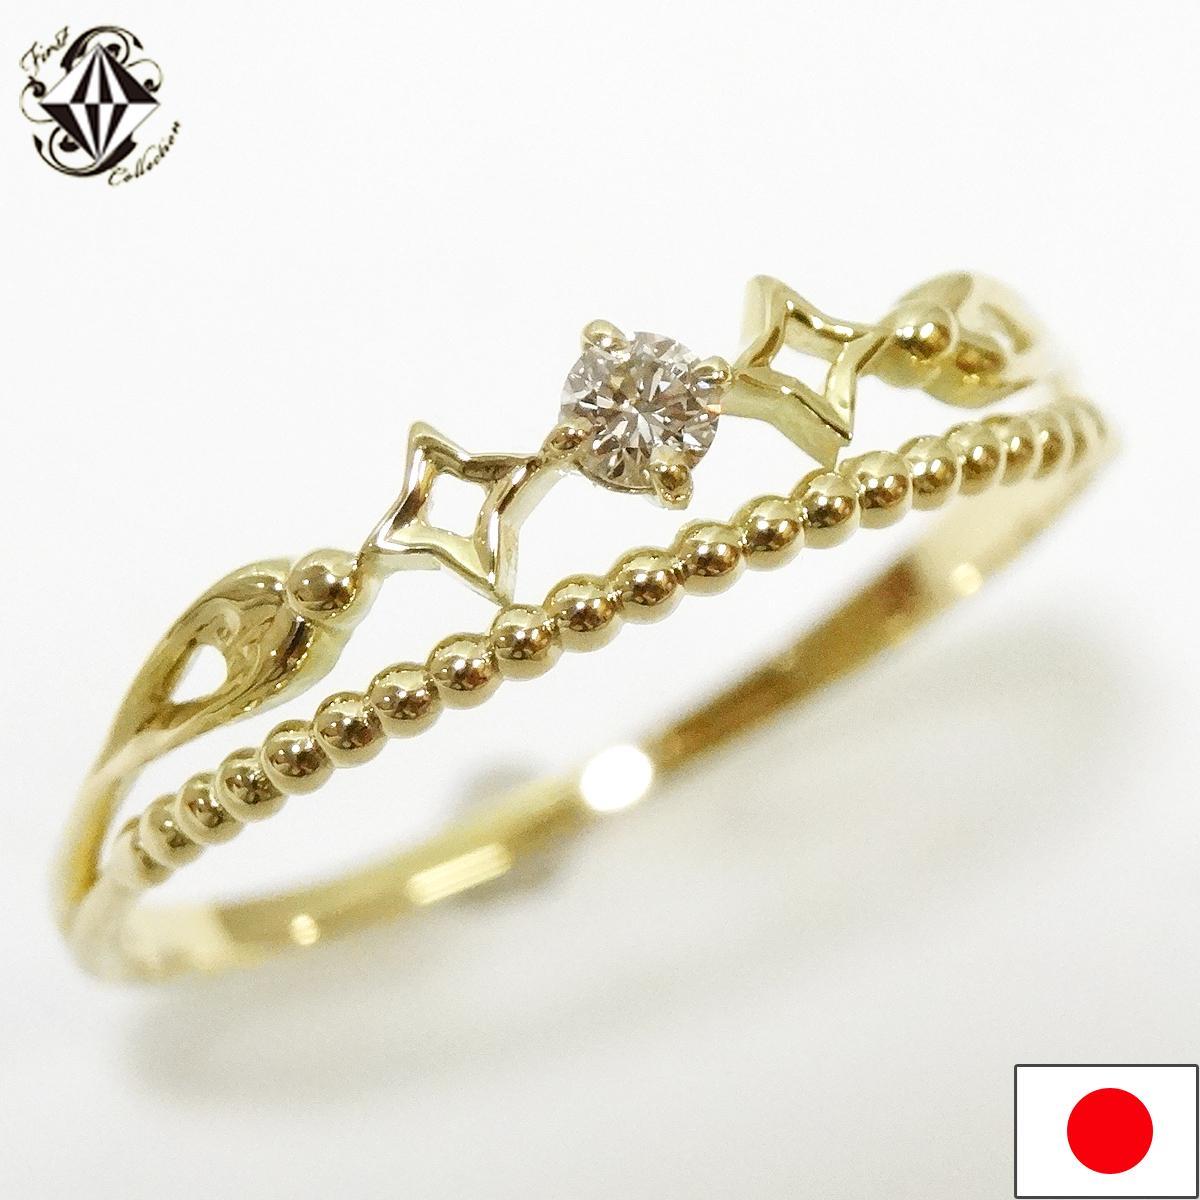 K18 リング 指輪 誕生石 天然 ピンキーリング 18金 ダイヤモンド ゴールド k18 普段使い 高品質 ティアラモチーフ